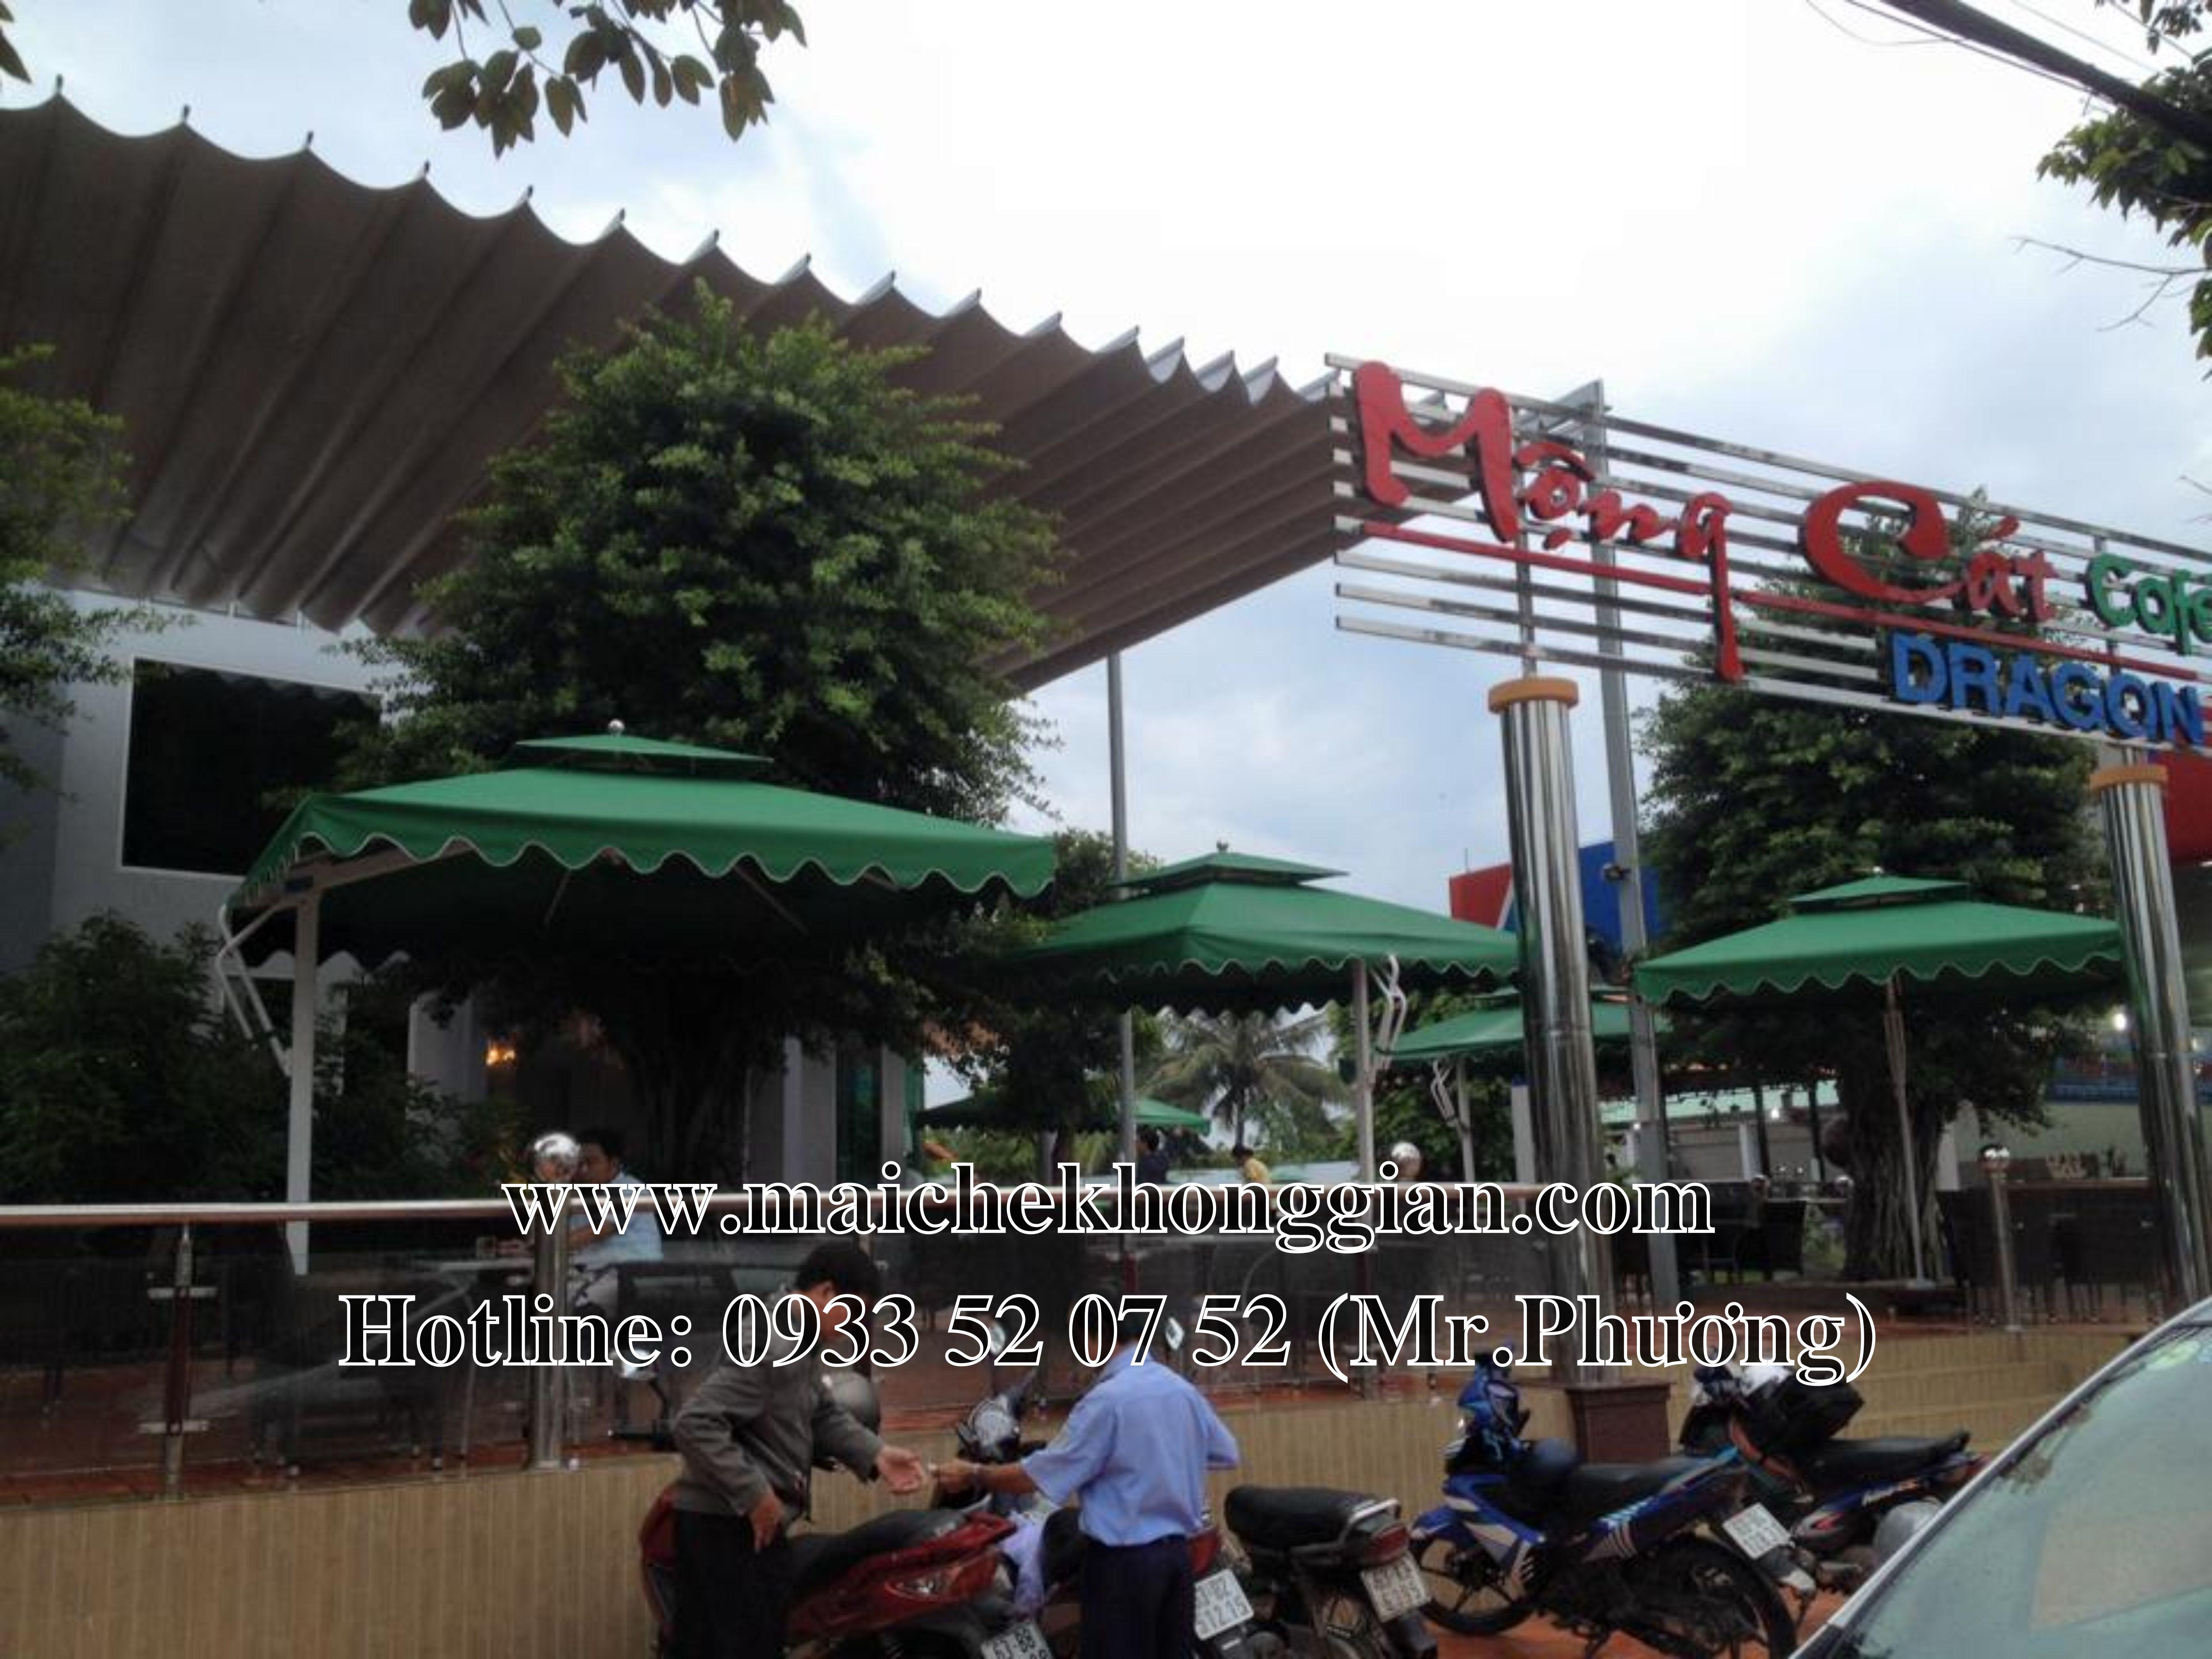 Mái xếp Quận 5 TP Hồ Chí Minh